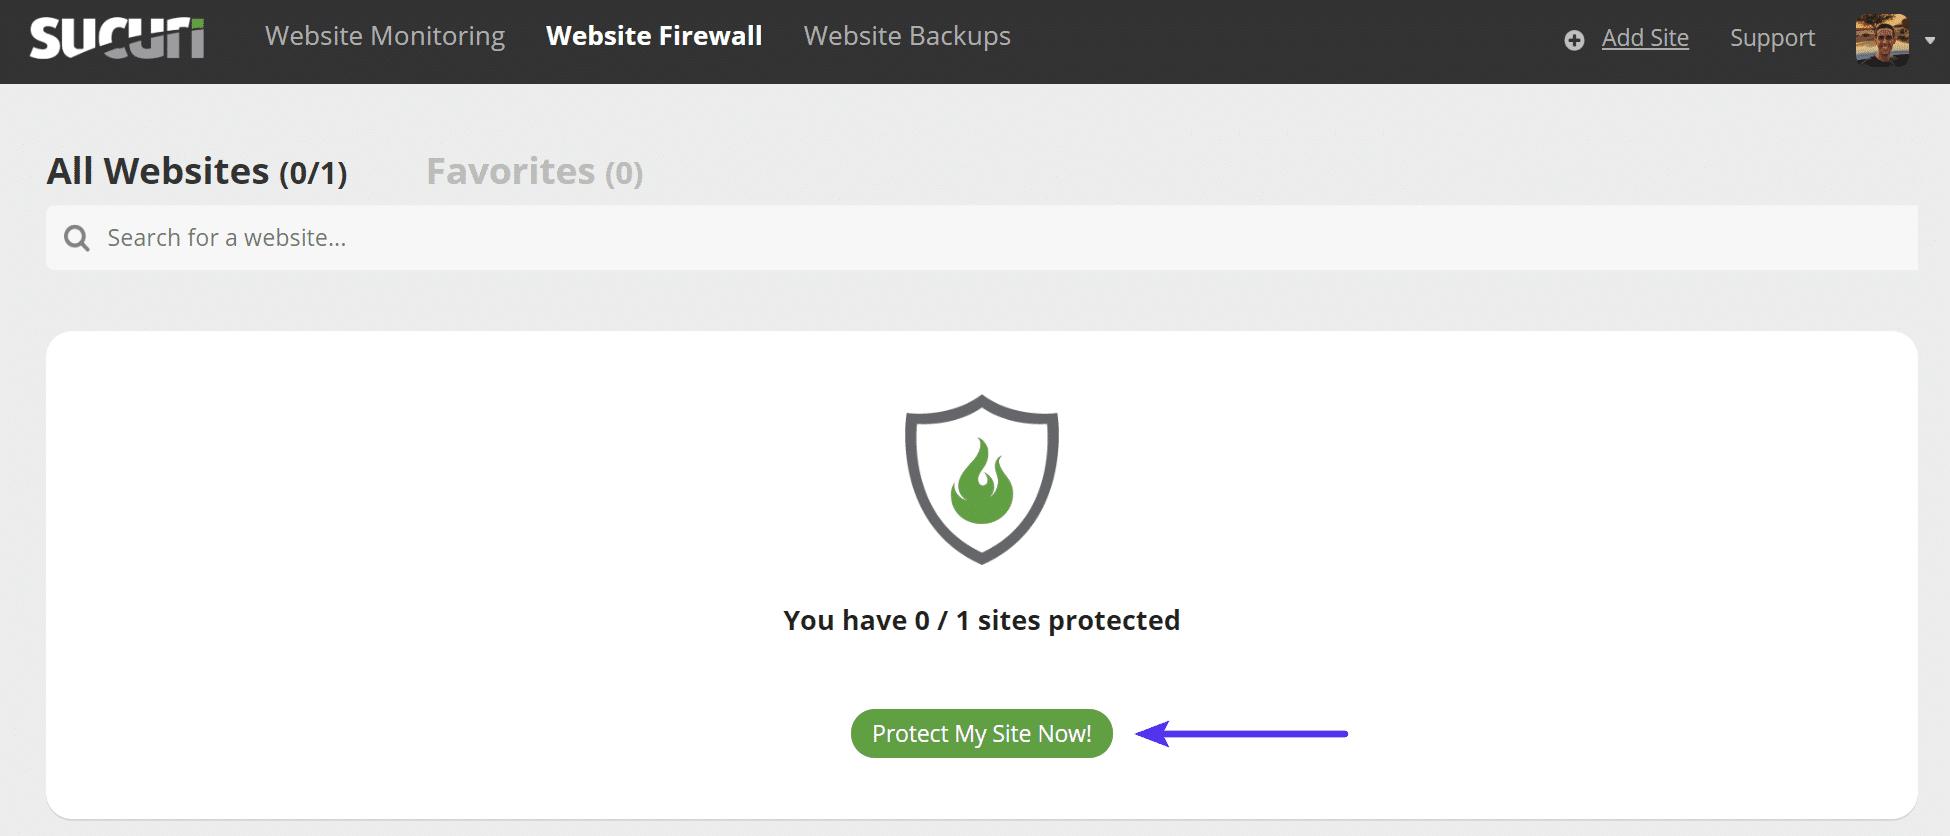 Sucuri beskytter mit websted